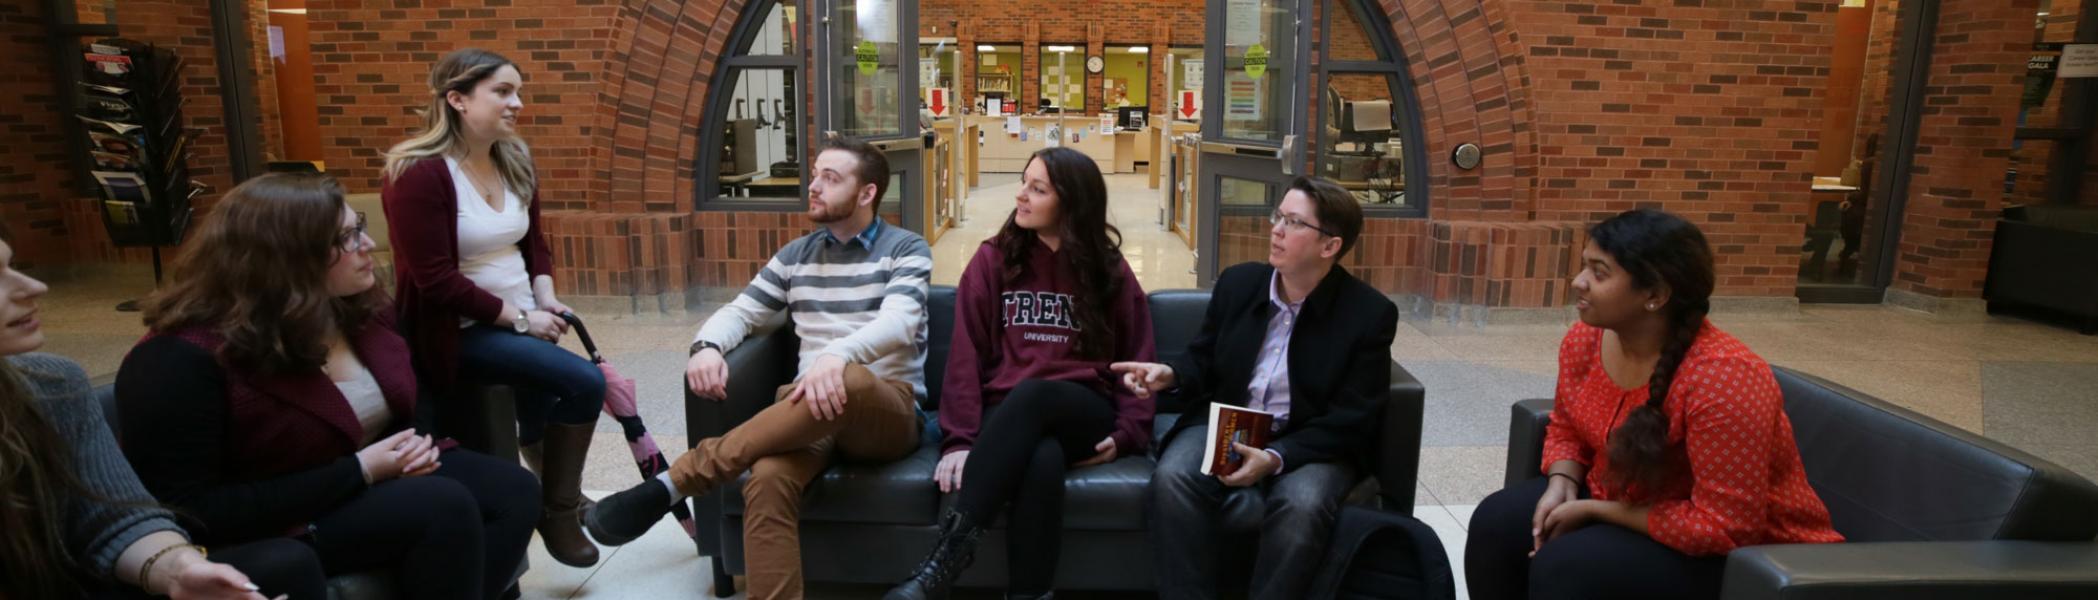 Trent University Durham GTA students having a discussion